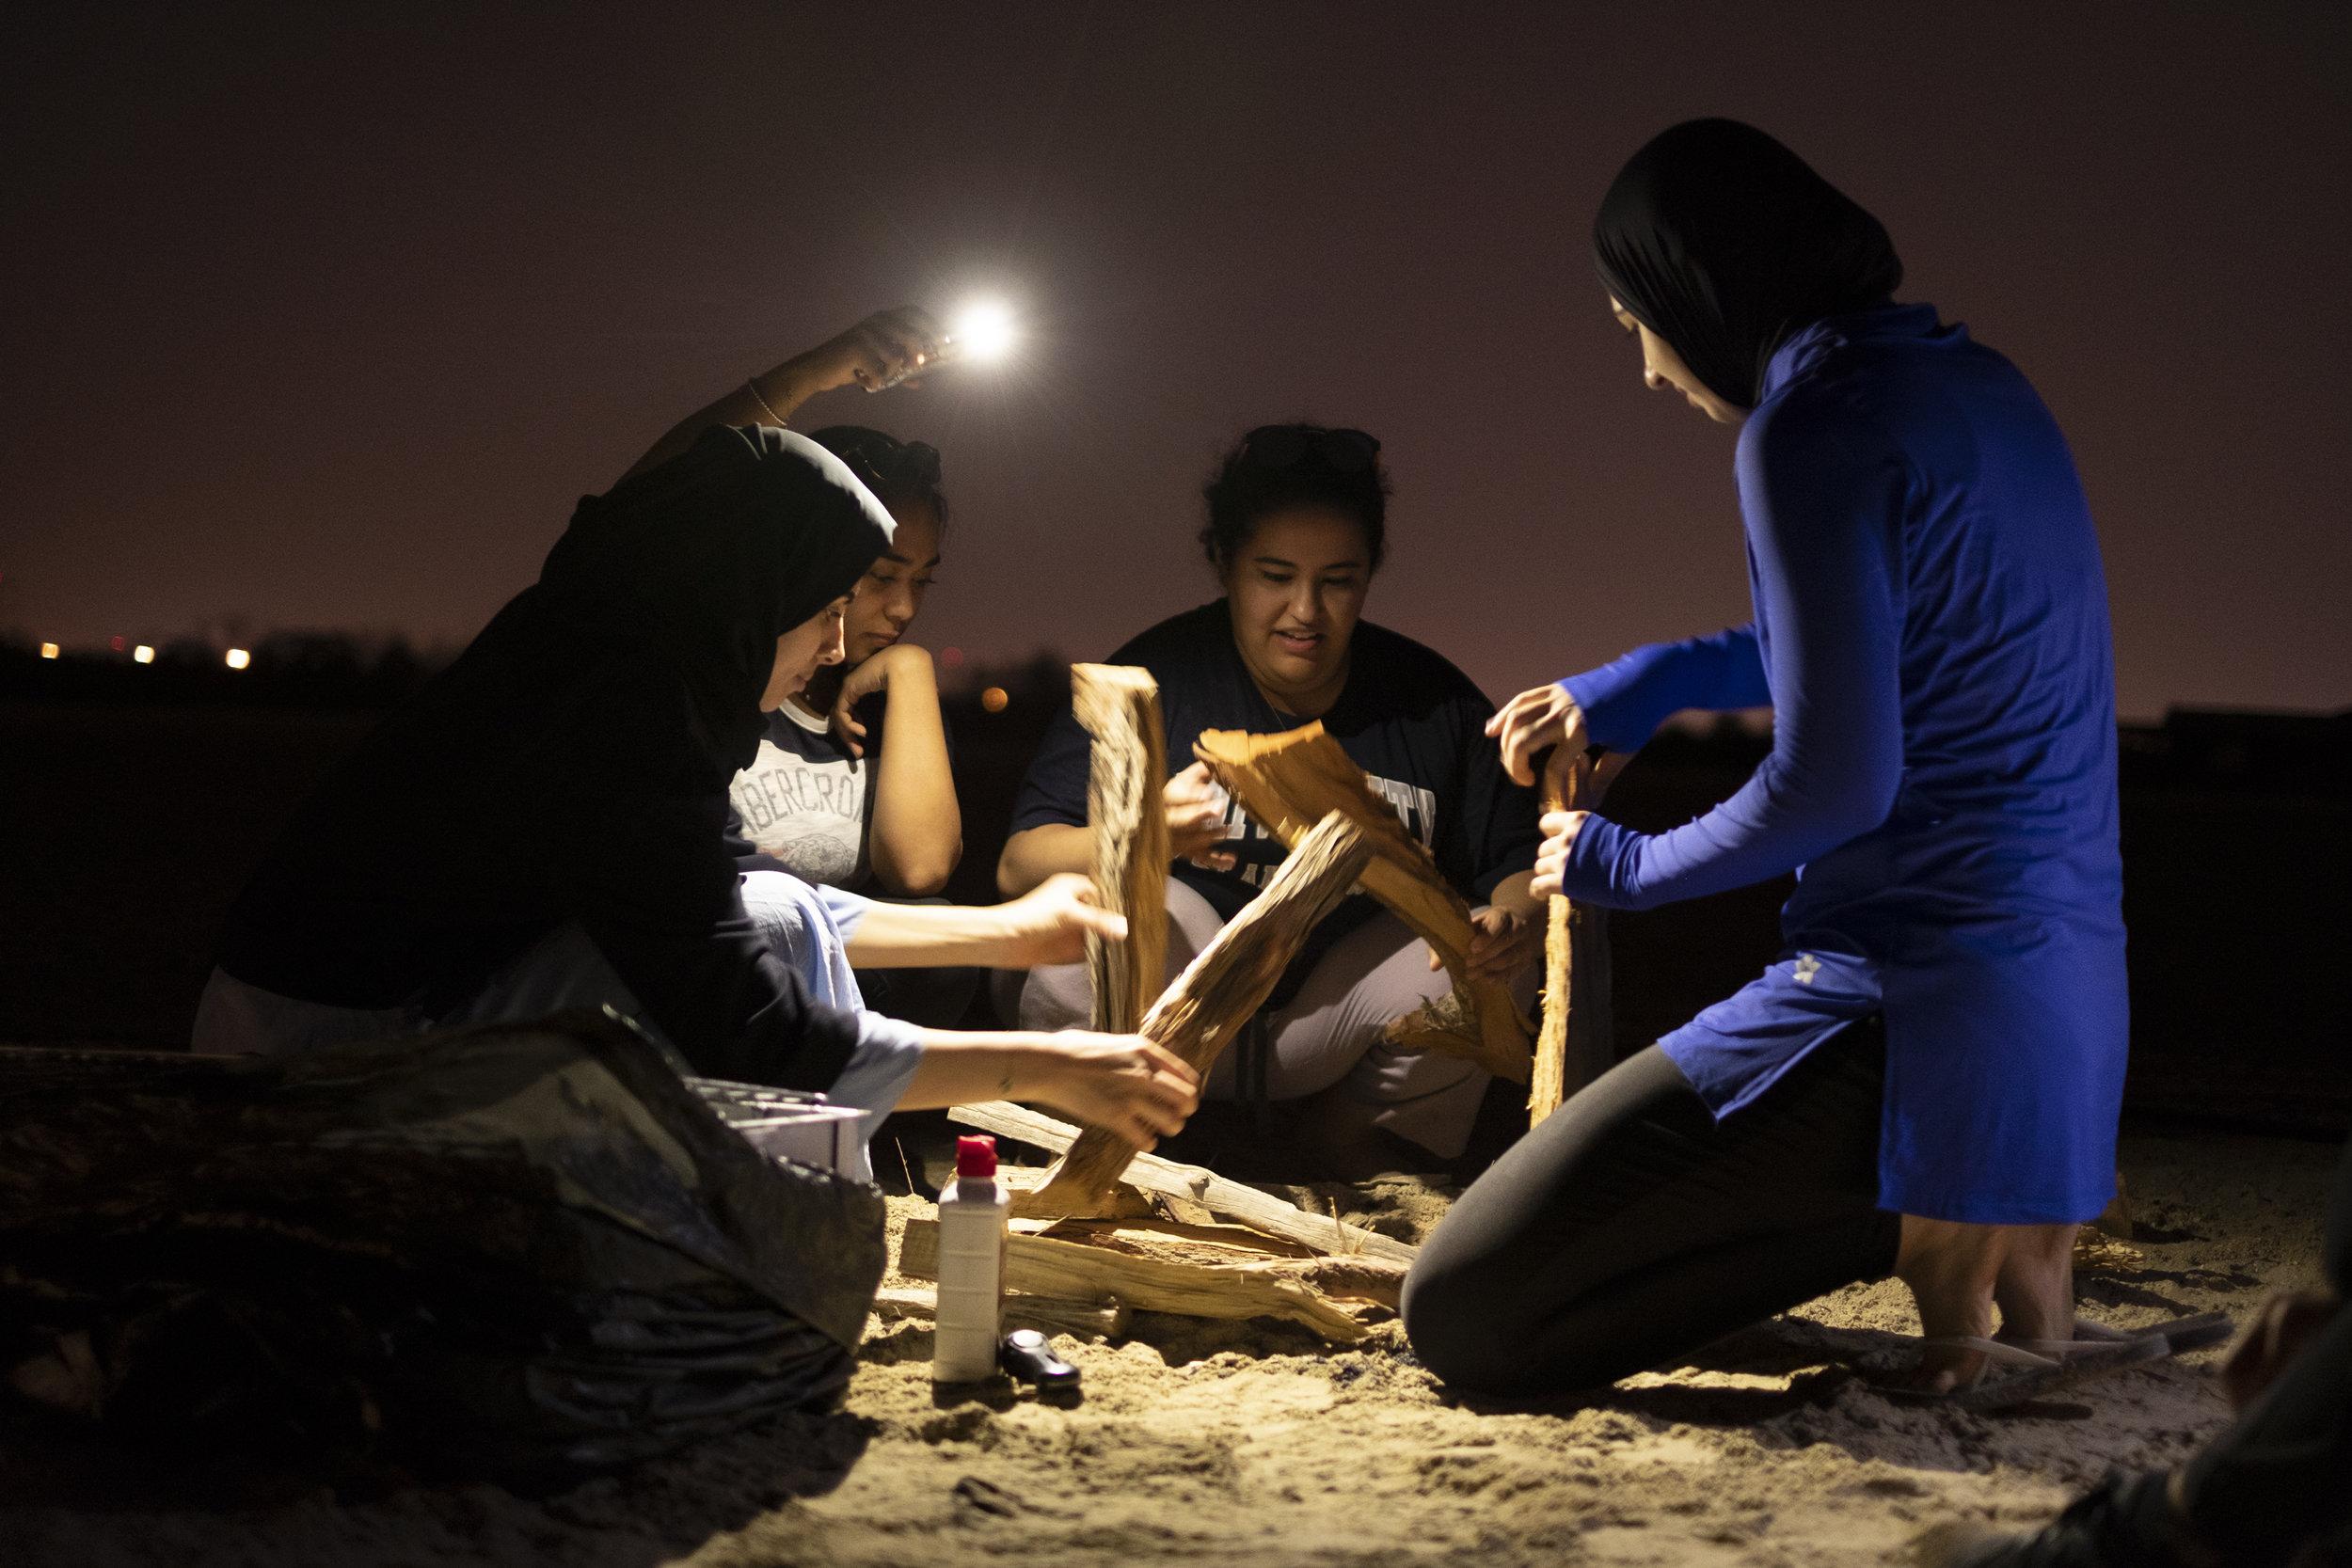 4 young women making the camp fire_Abu Dhabi_(c)Oliver Wheeldon.jpg